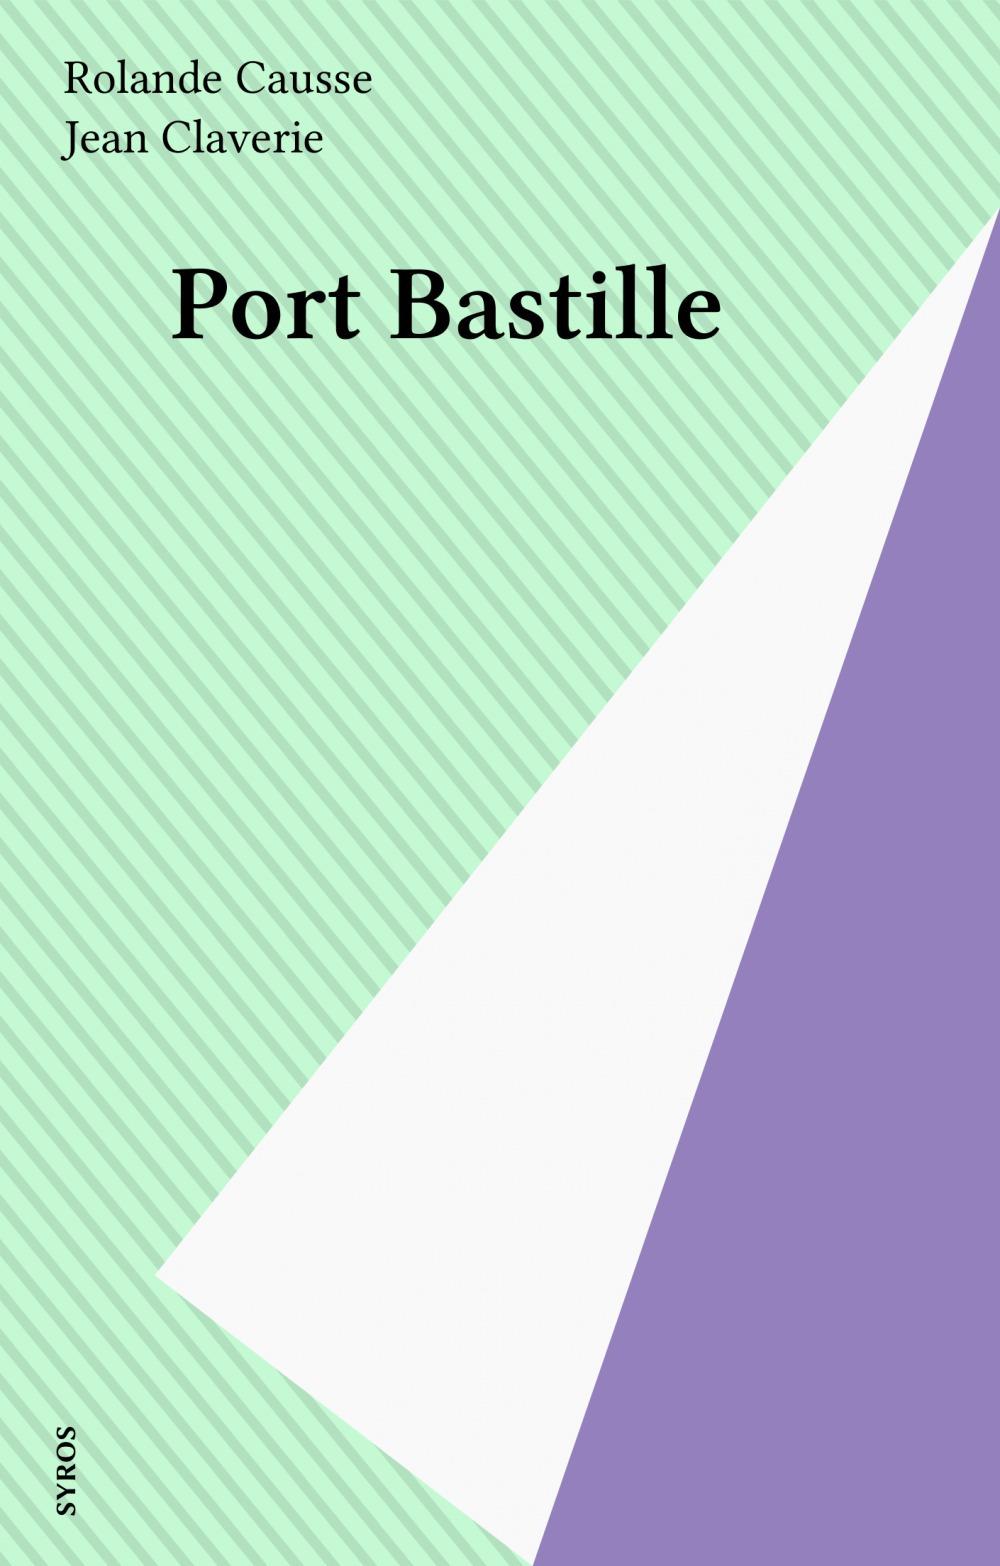 Port bastille